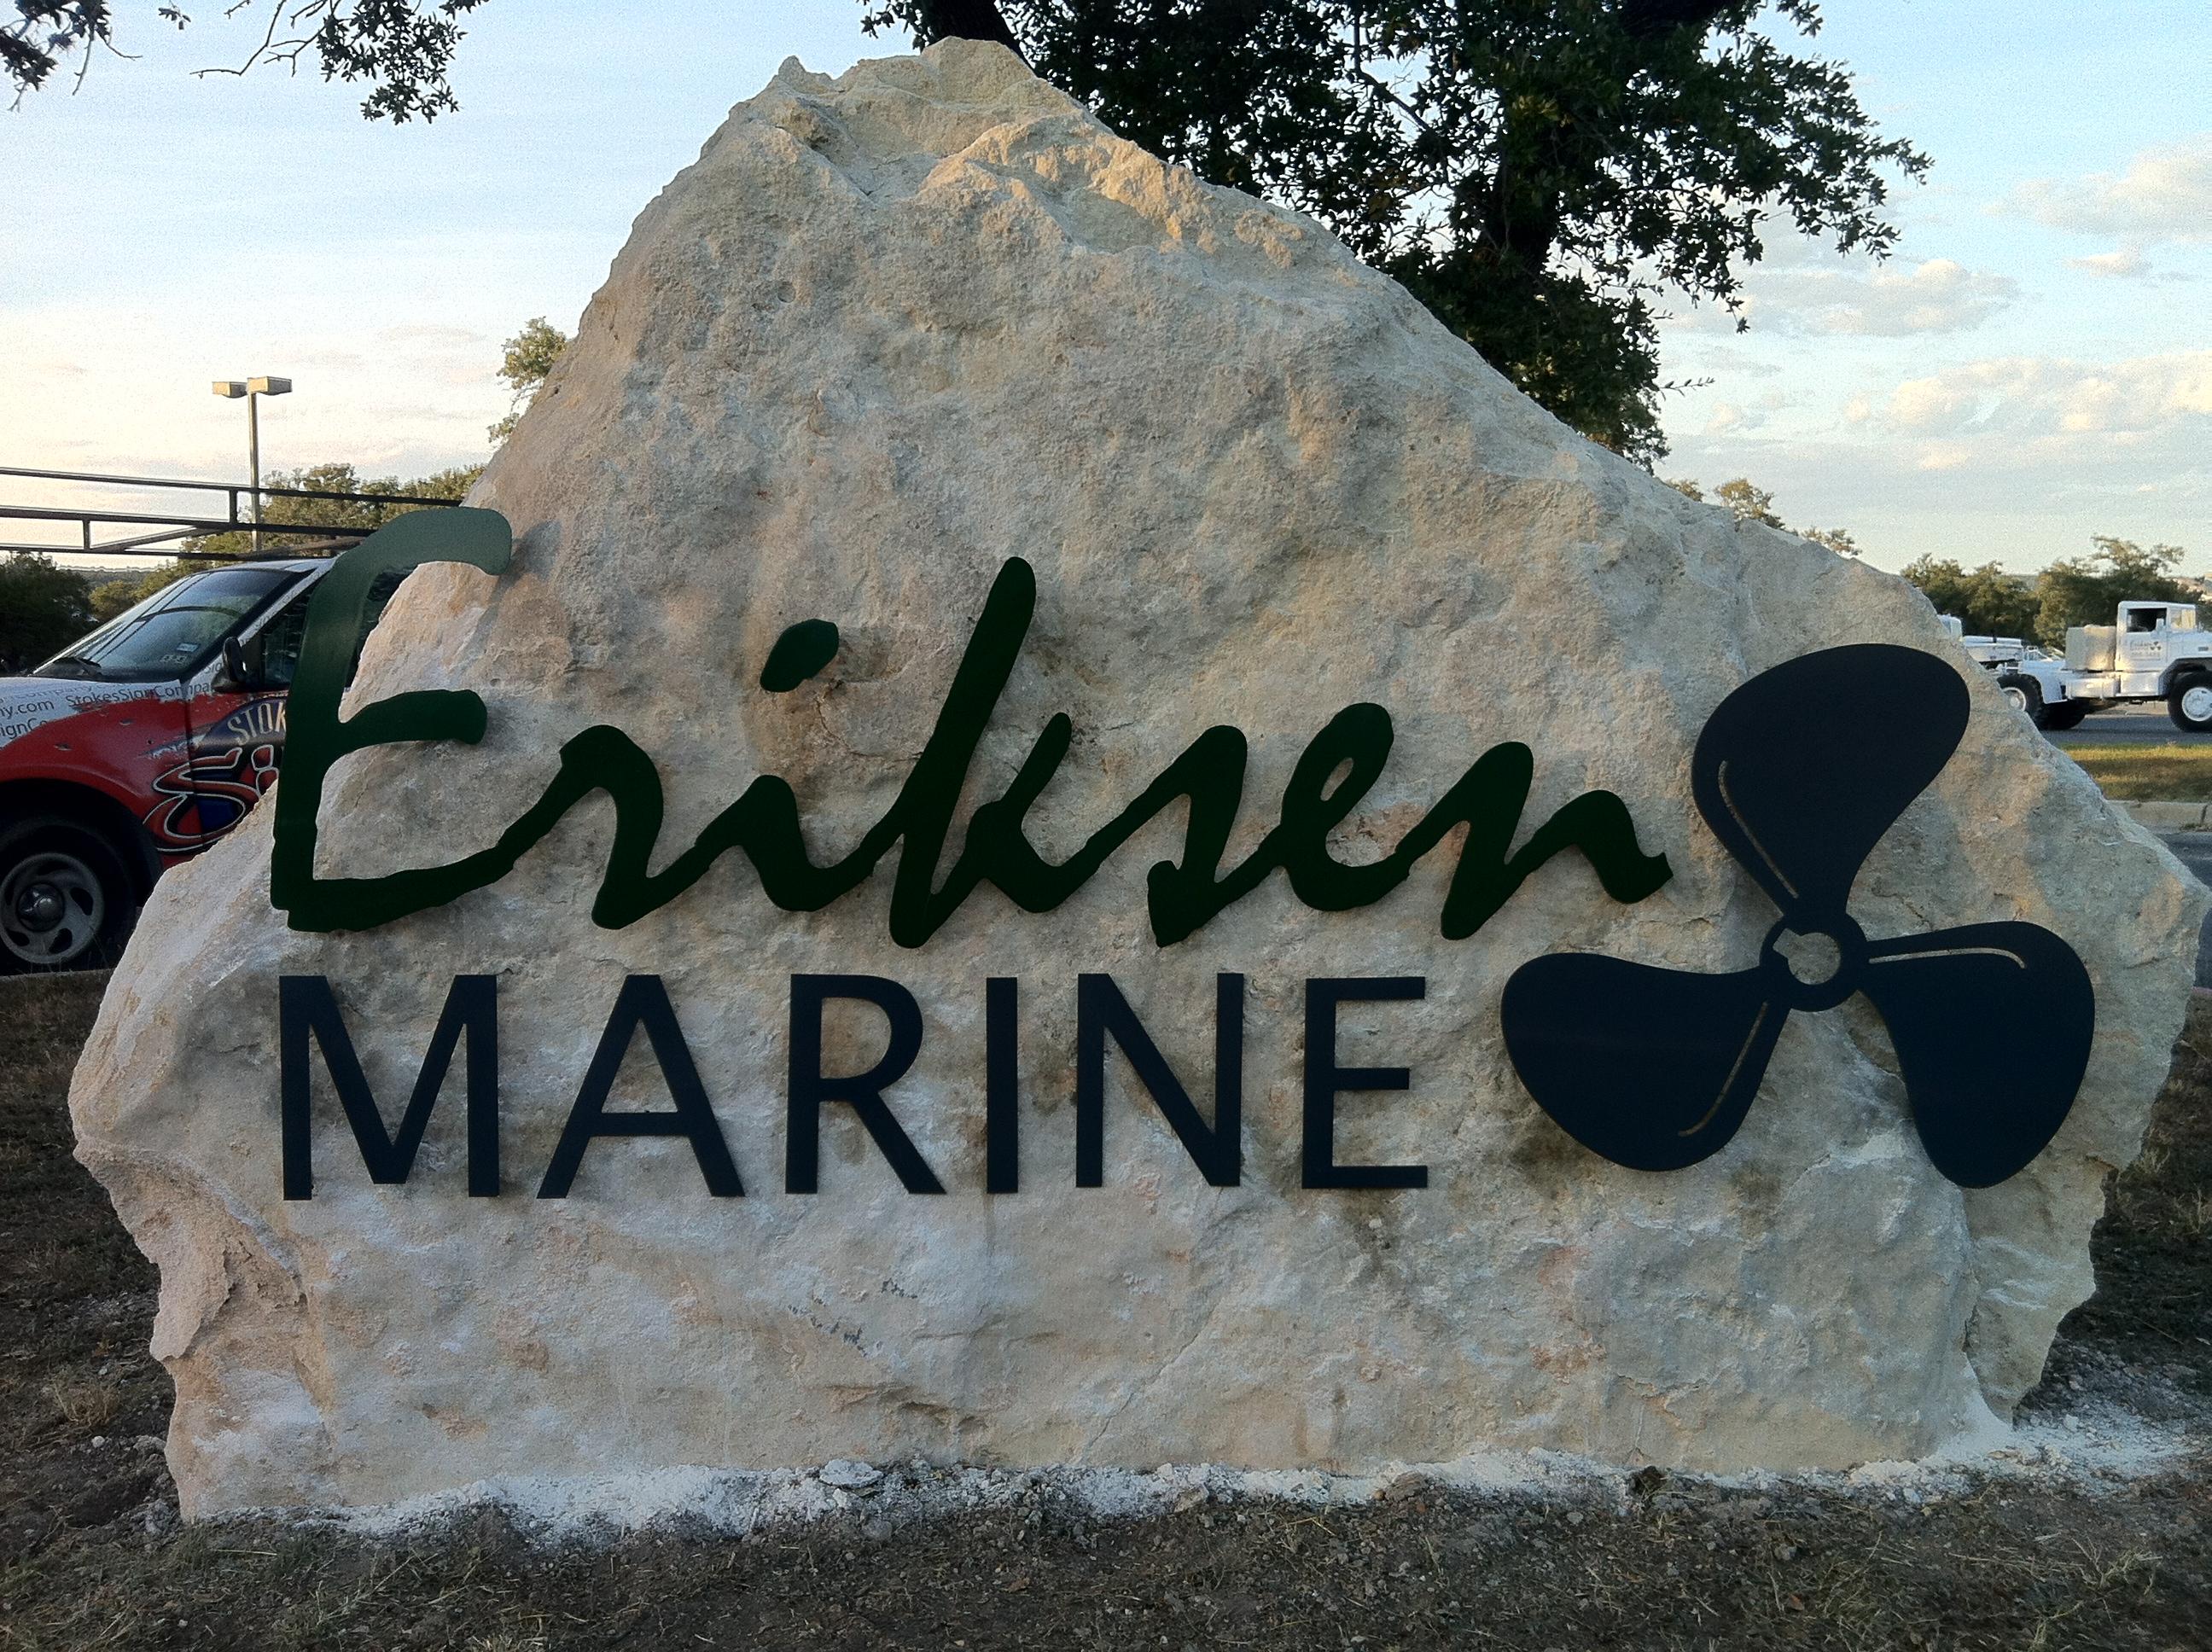 Erickson Marine Lettering in Stone